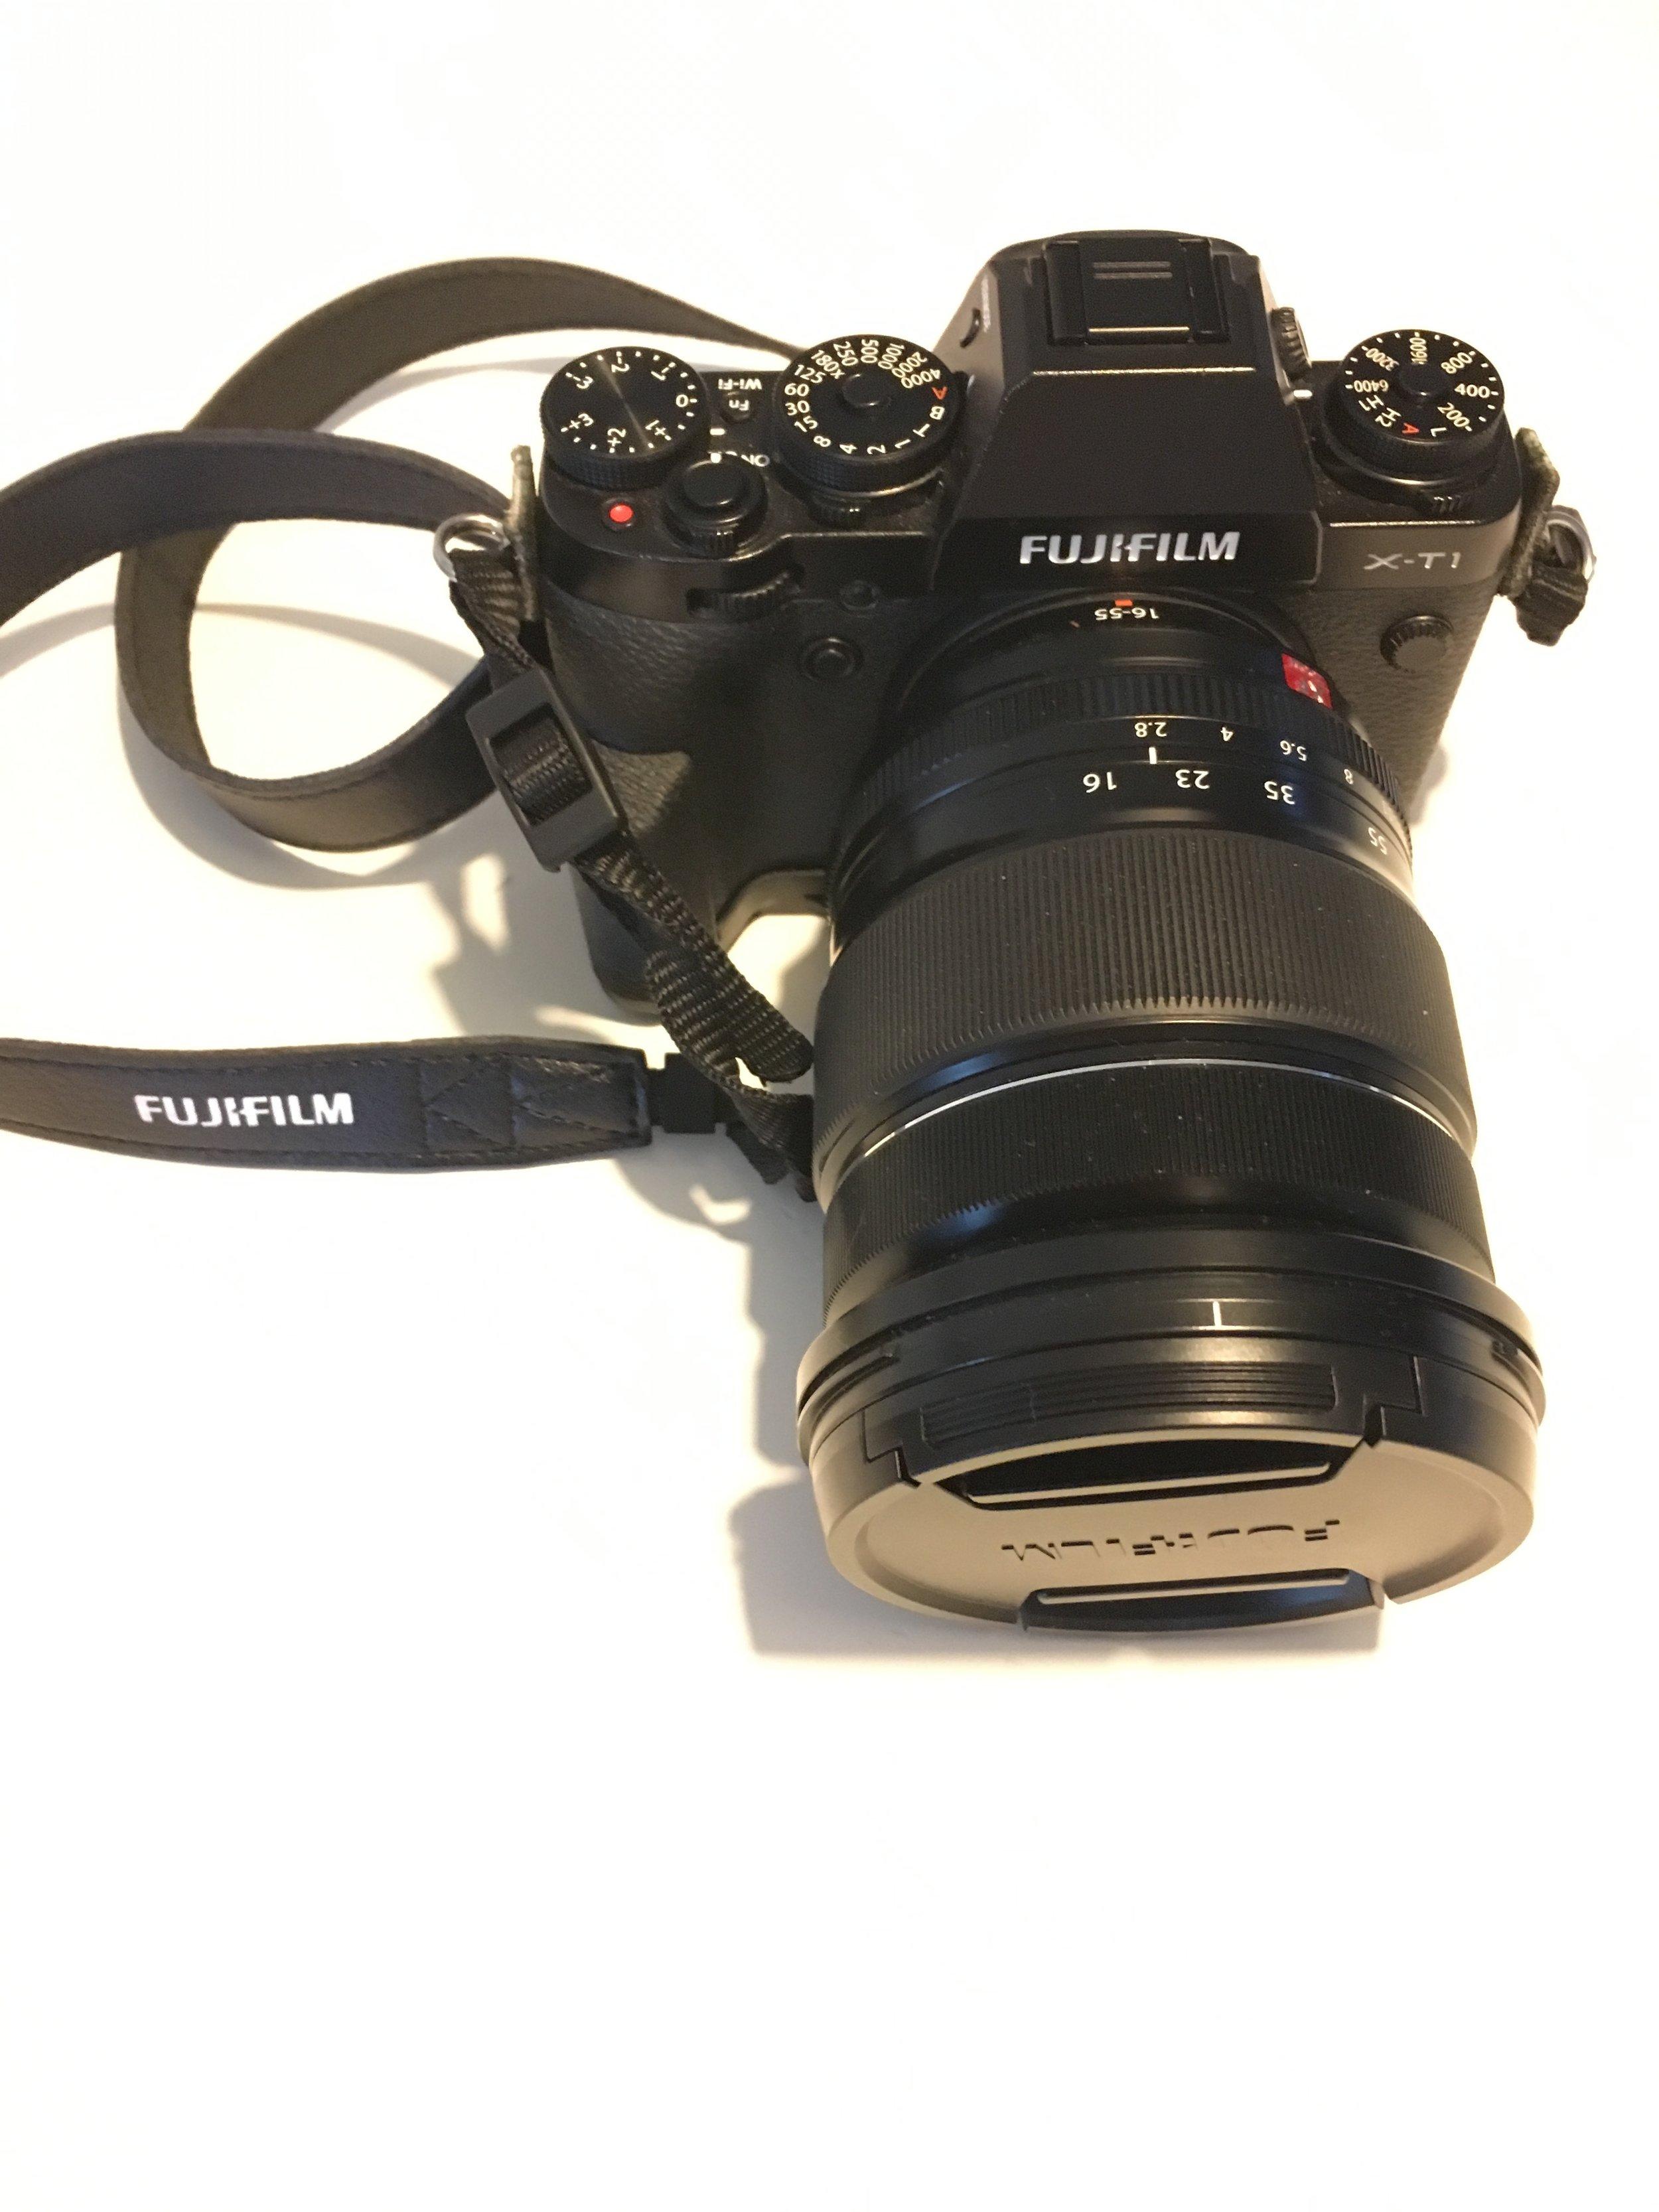 Fujifilm X-T1 - met de lichtsterke Fujinon 16-55 f2.8 WR